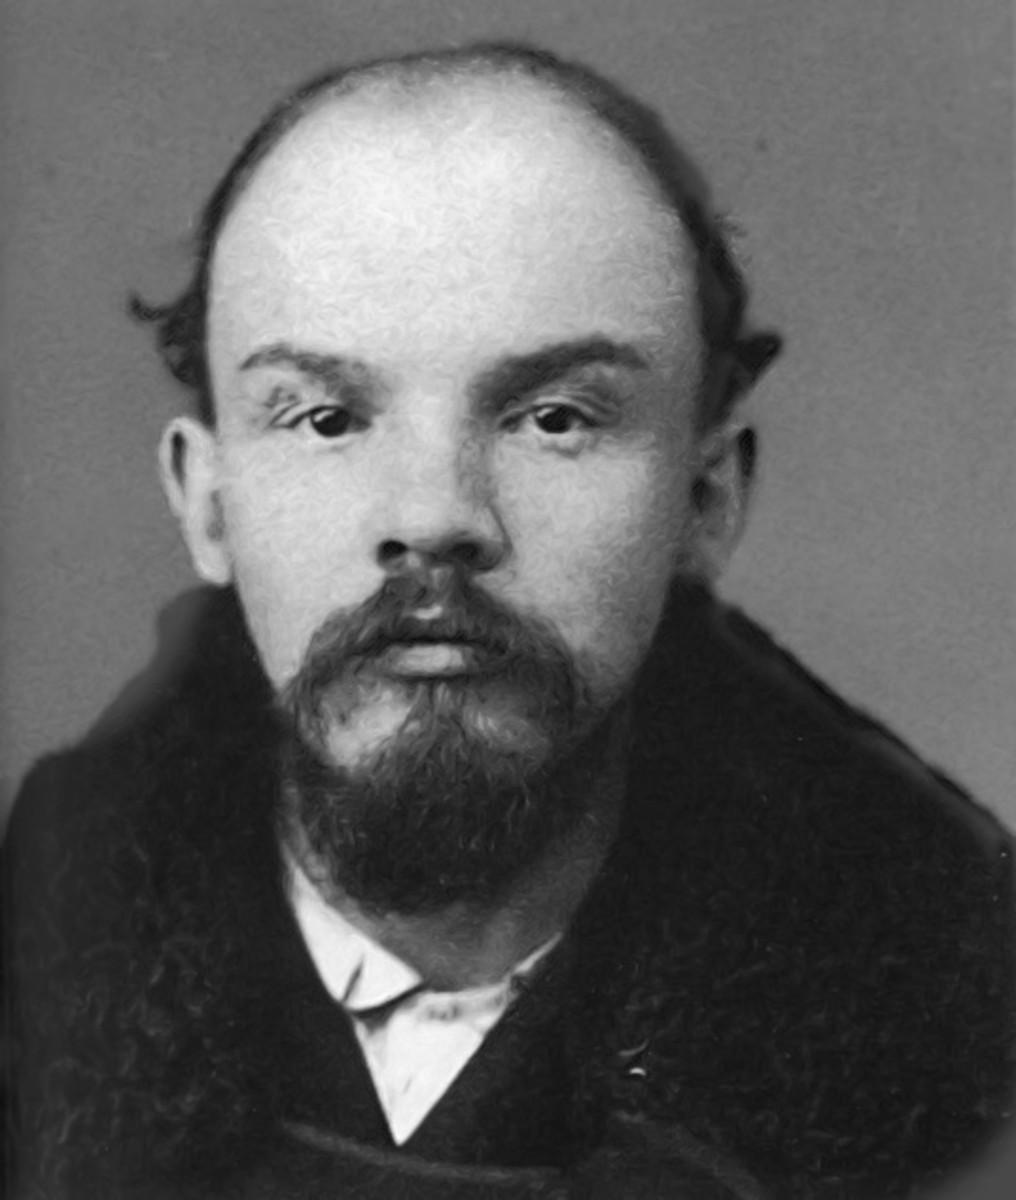 VLADIMIR LENIN 1895